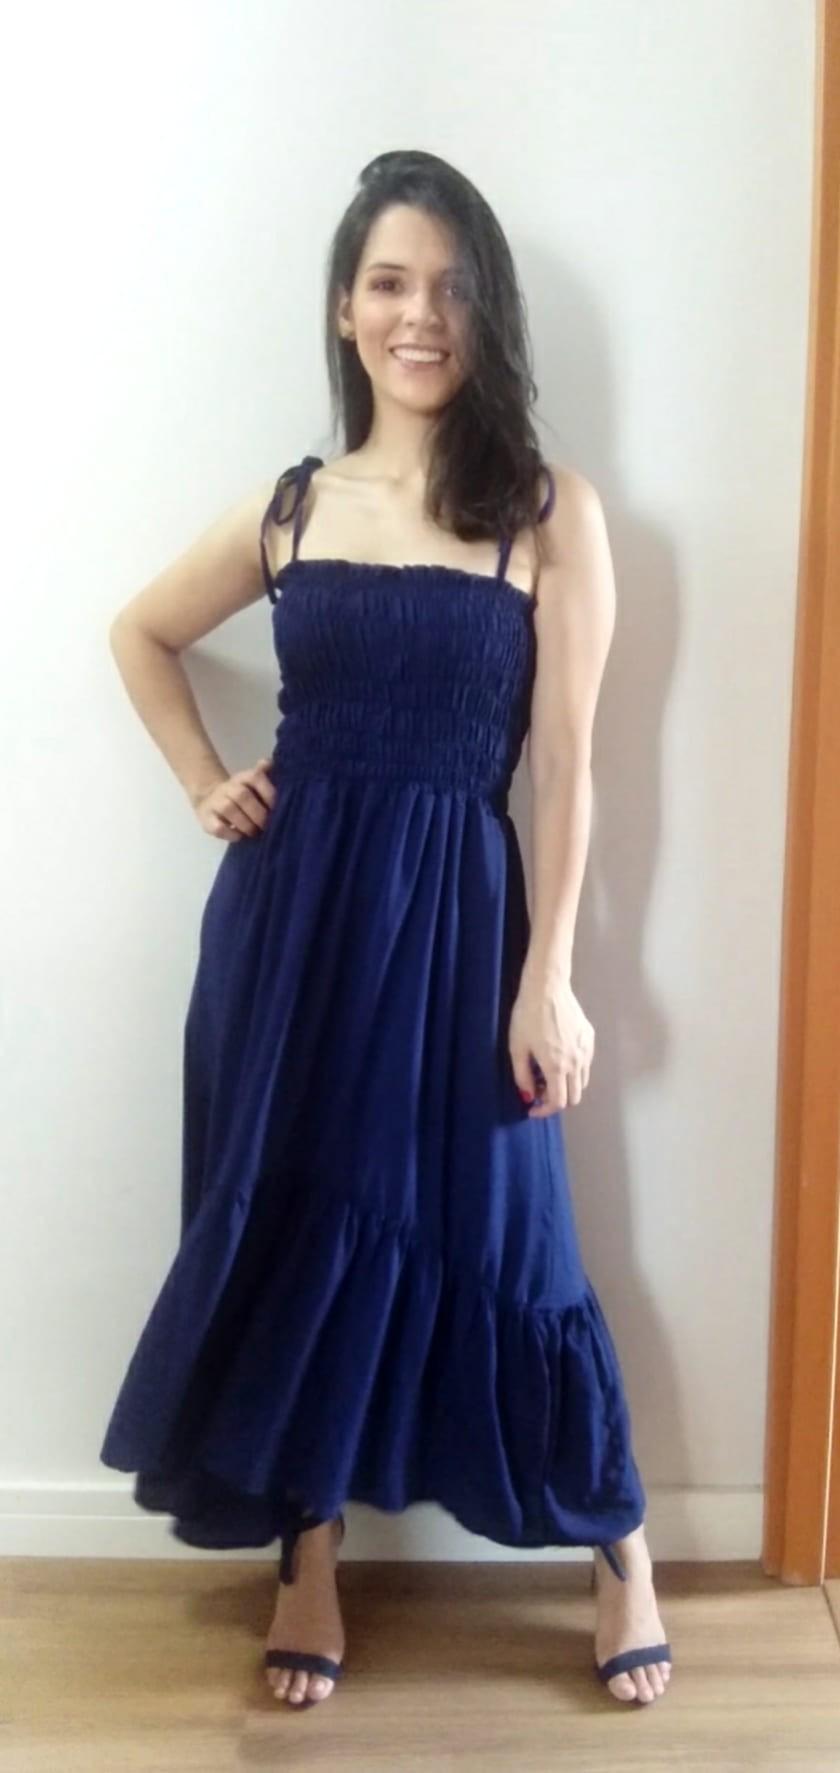 Vestido apego